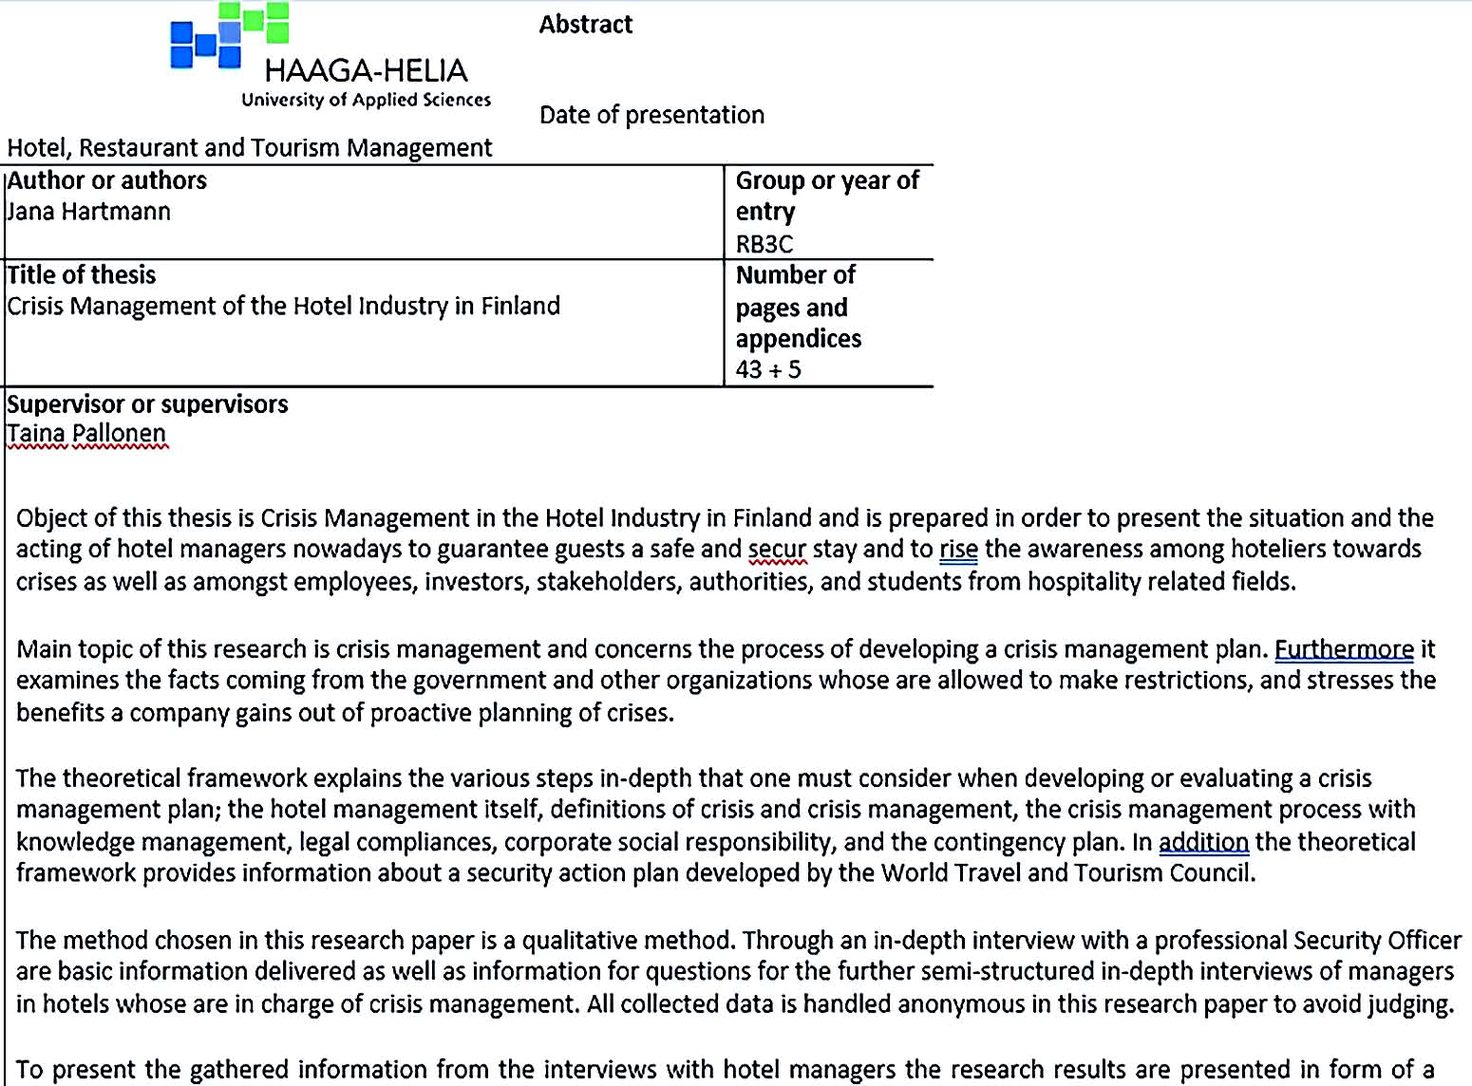 Crisis Management Plan for Hotel